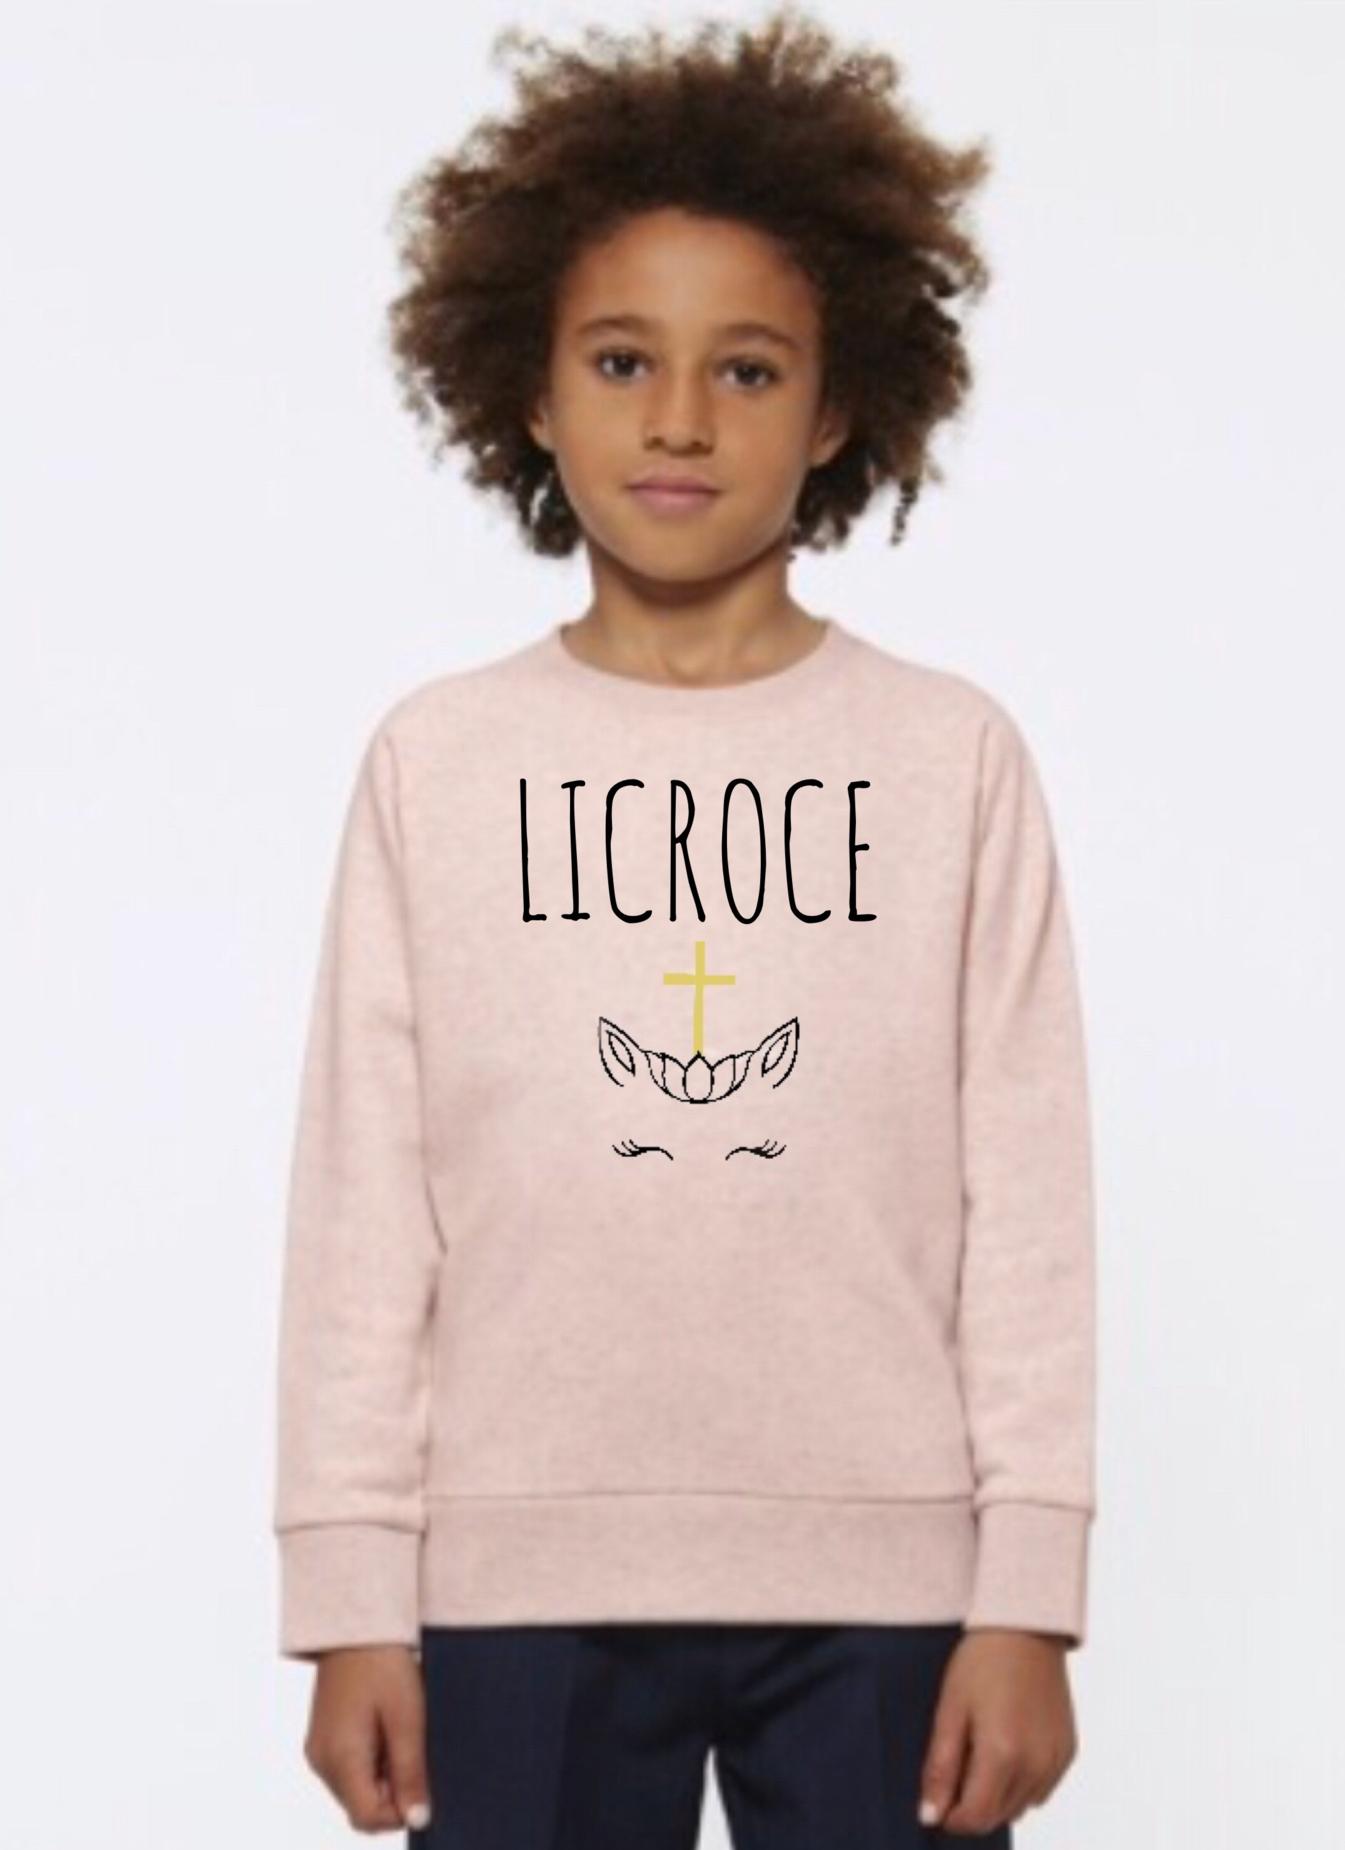 LICROCE